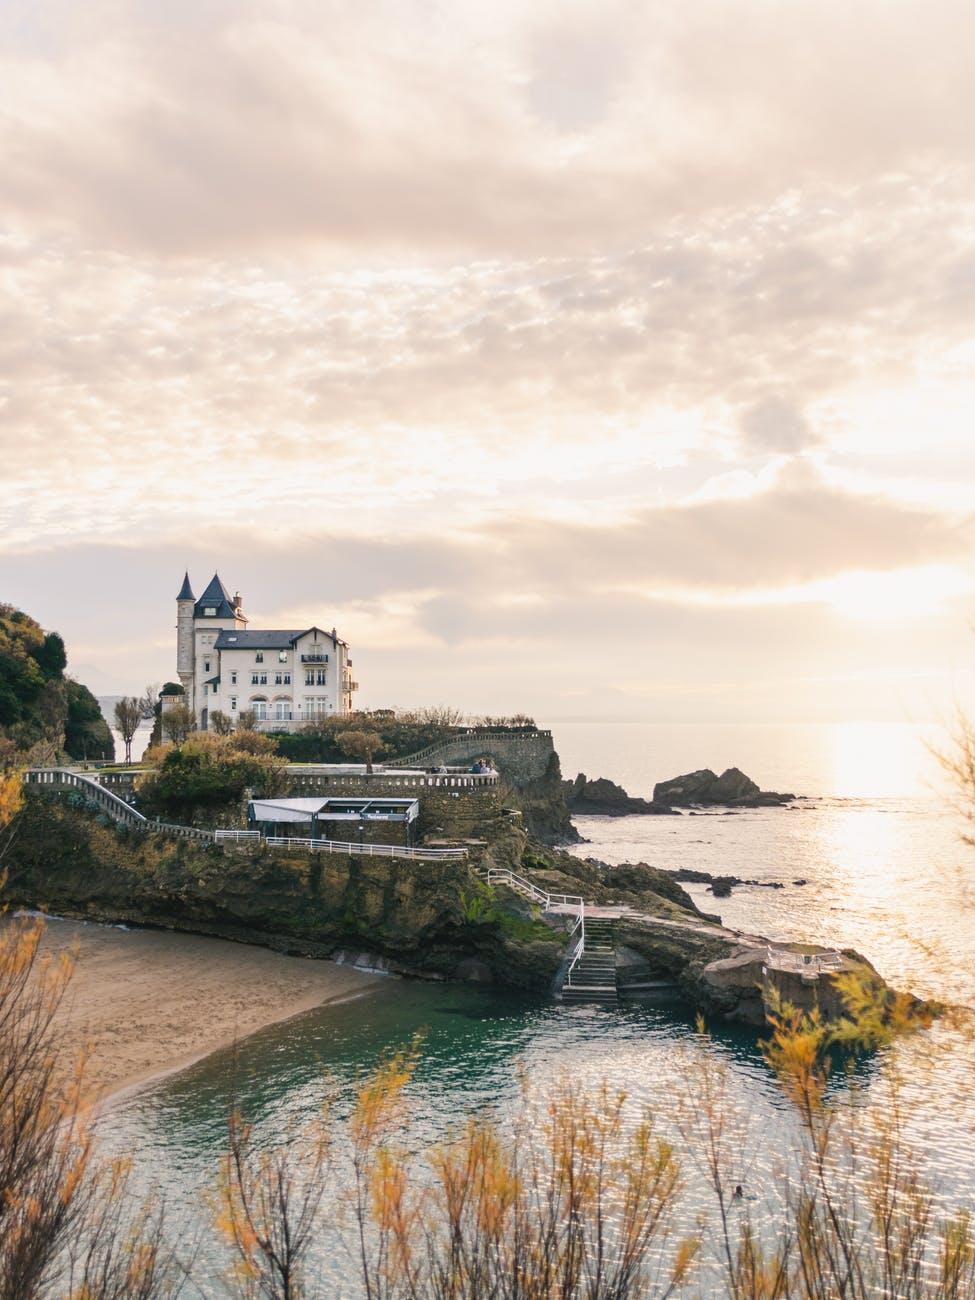 old castle on rocky coast near sea